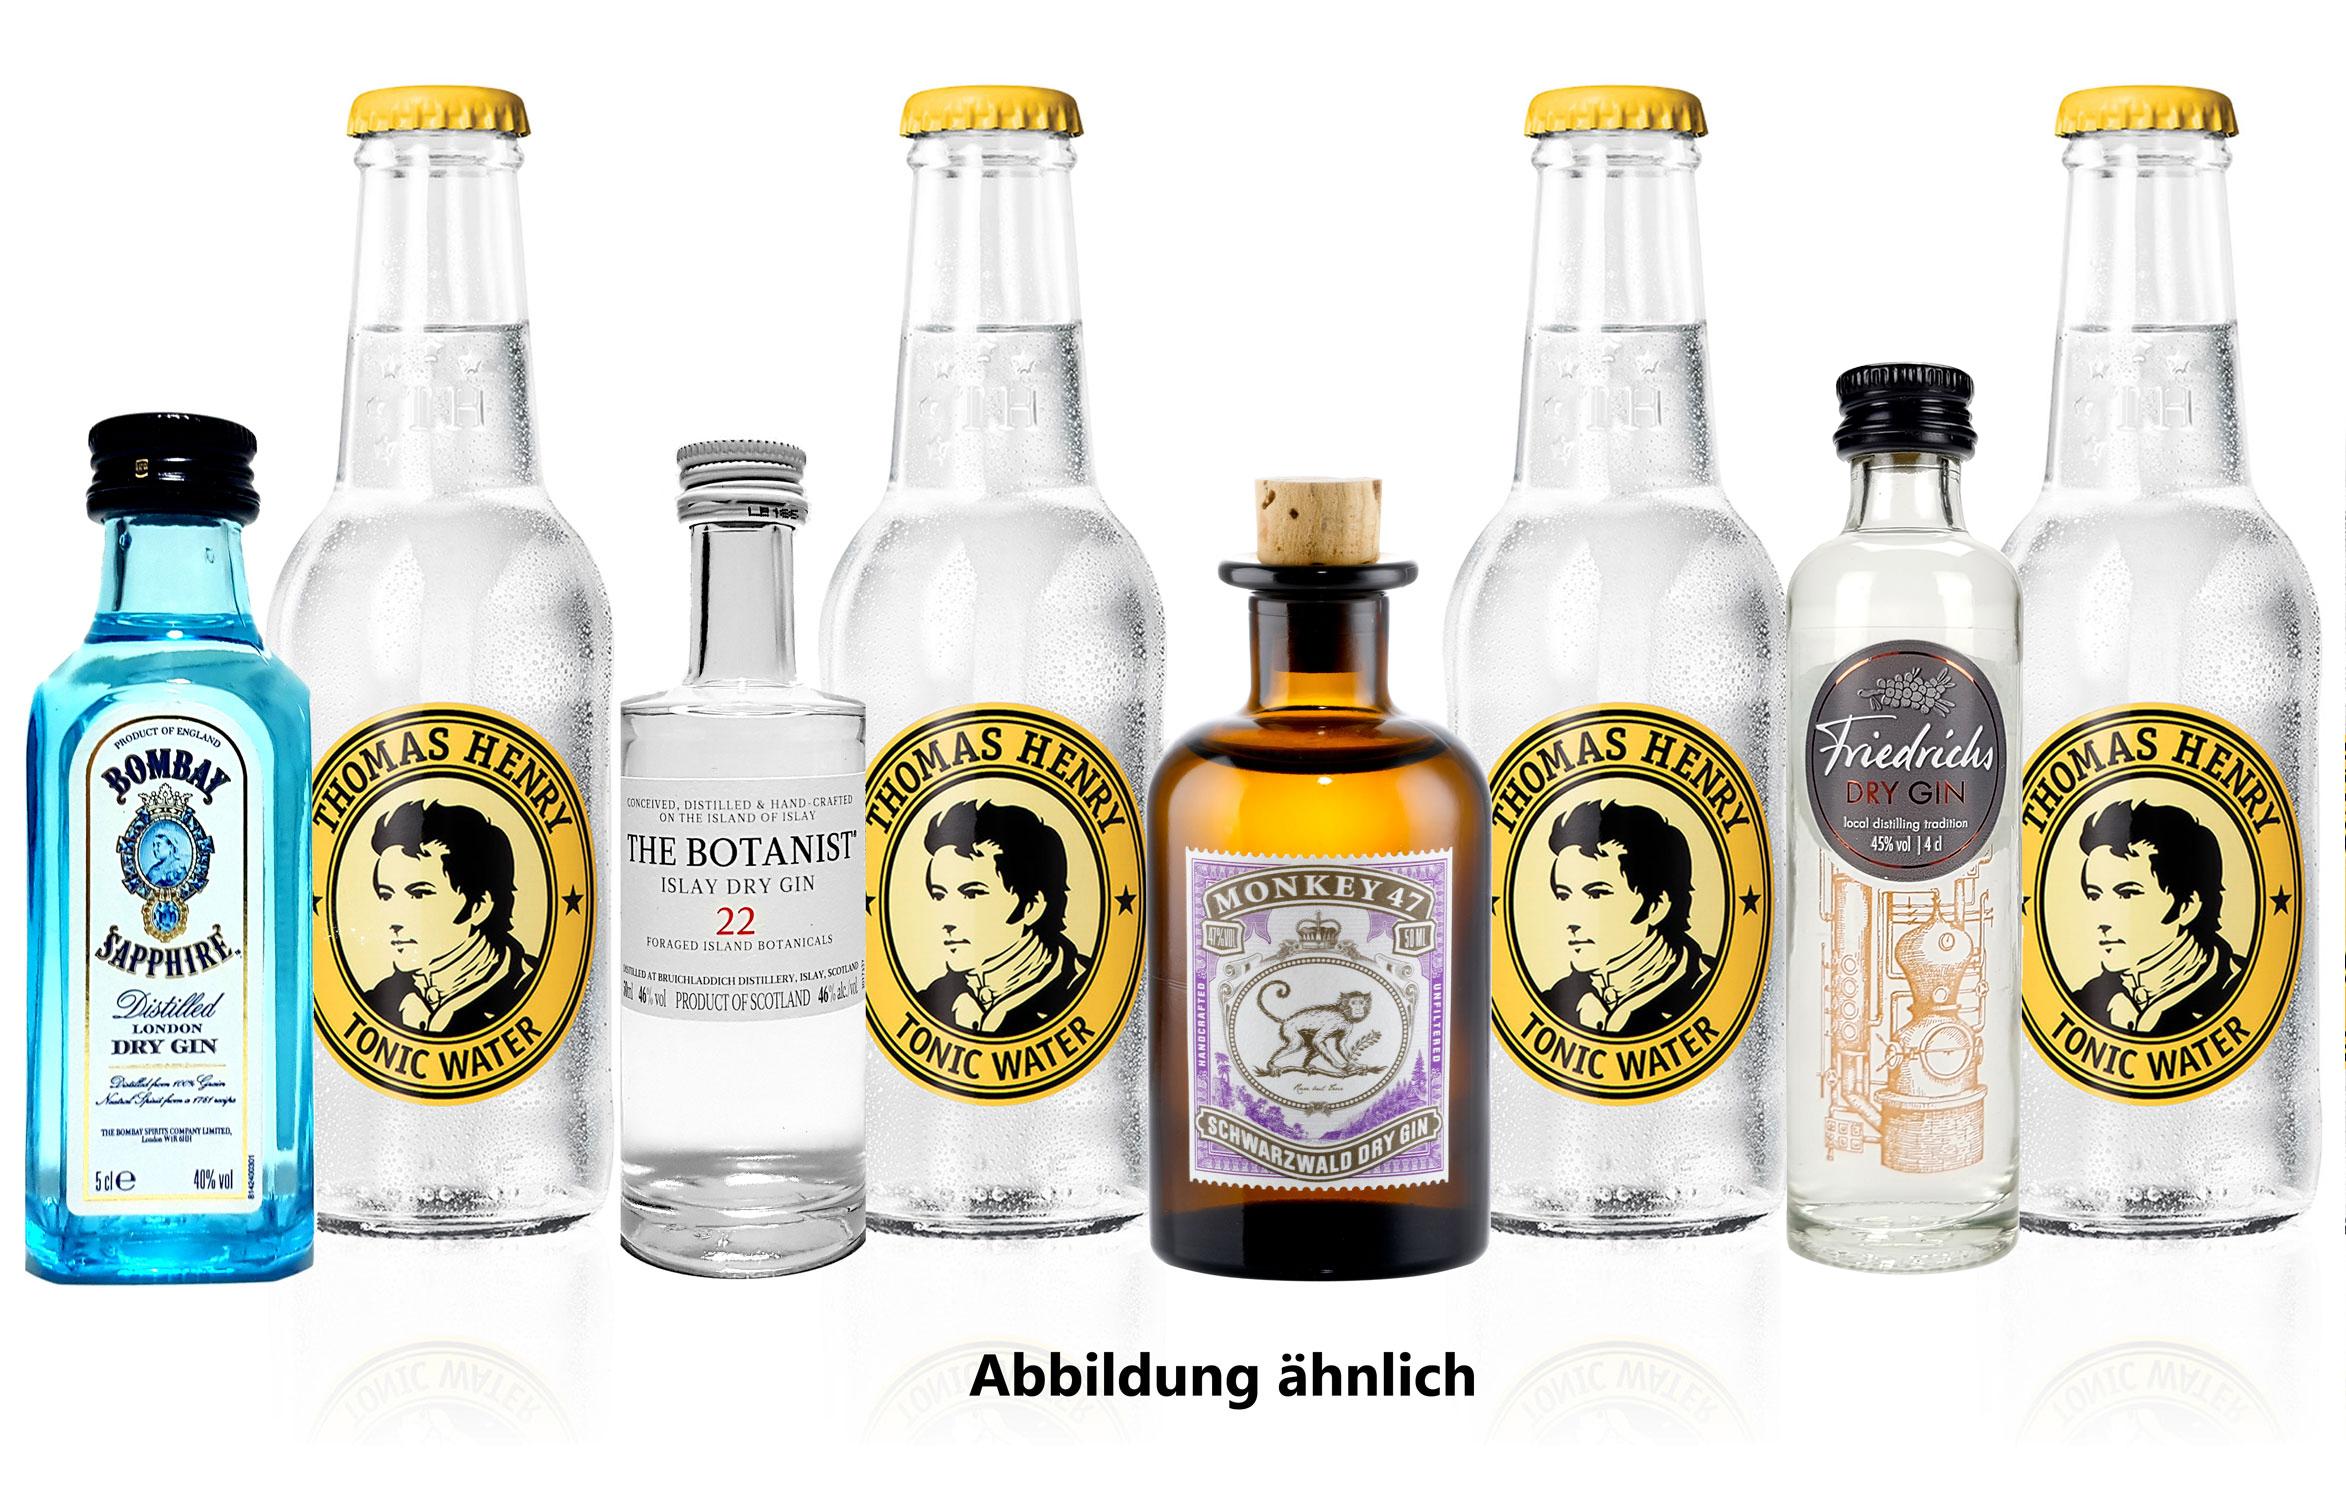 Gin Tonic mini 4er Set - Bombay Sapphire London Dry Gin 50ml (40% Vol) + Monkey 47 Schwarzwald Dry Gin 50ml (47% Vol) + The Botanist Islay Dry Gin 50ml (46% Vol) + Friedrichs Dry Gin 4cl (45% Vol) - Inkl. Pfand MEHRWEG